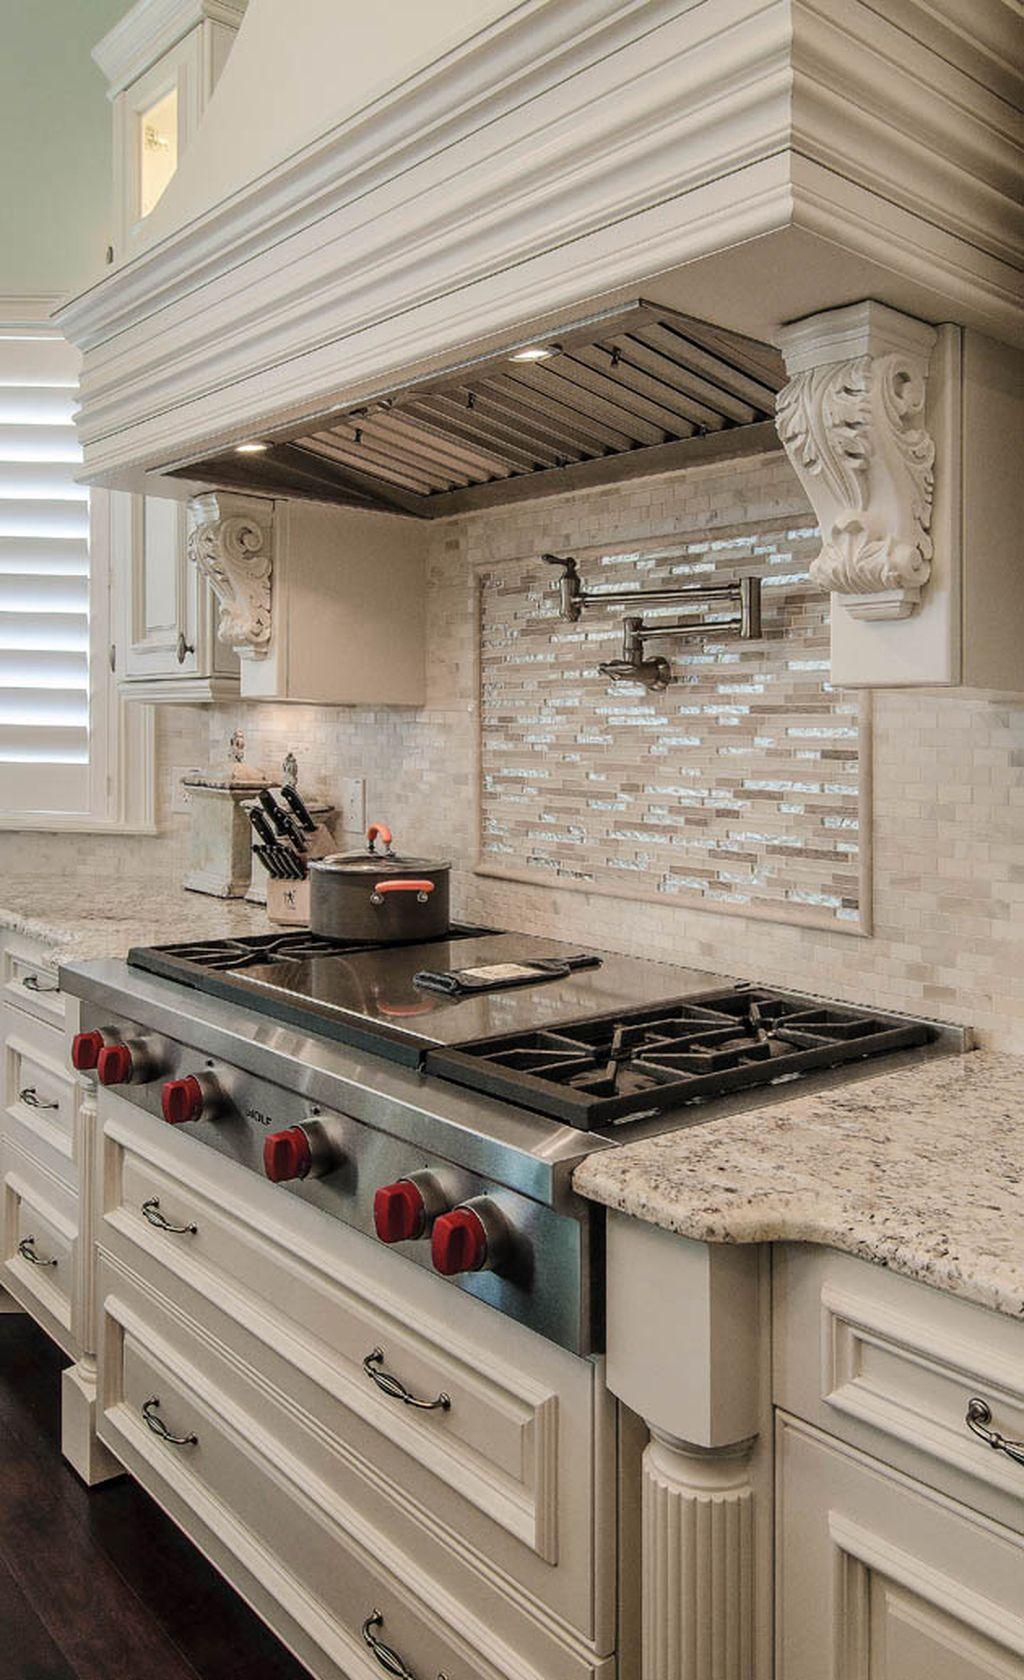 99 Totally Outstanding Traditional Kitchen Decoration IdeasHomeDecorish